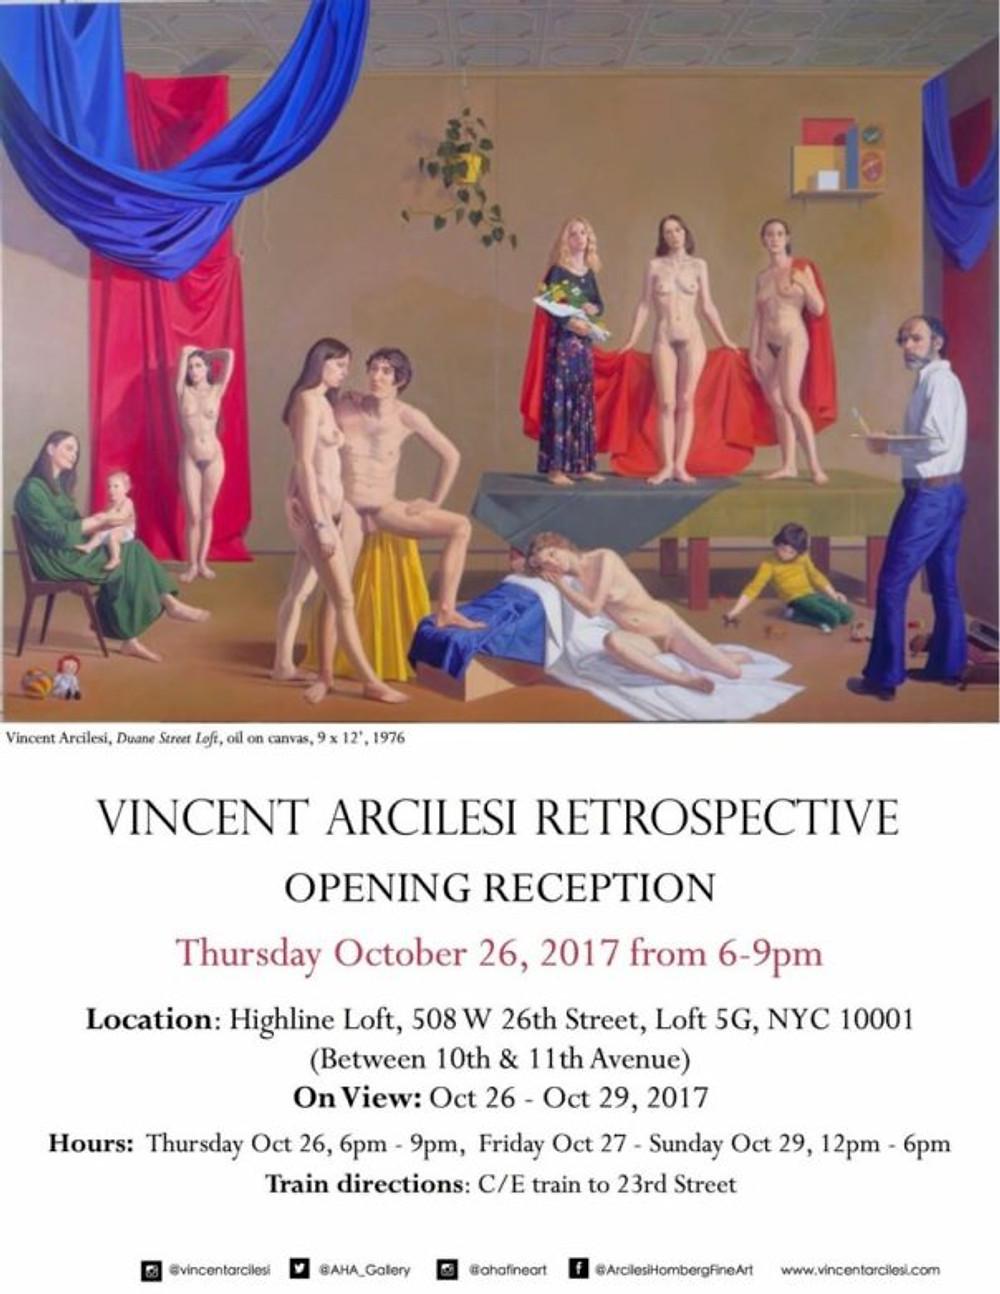 Vincent Arcilesi Retrospective 2017